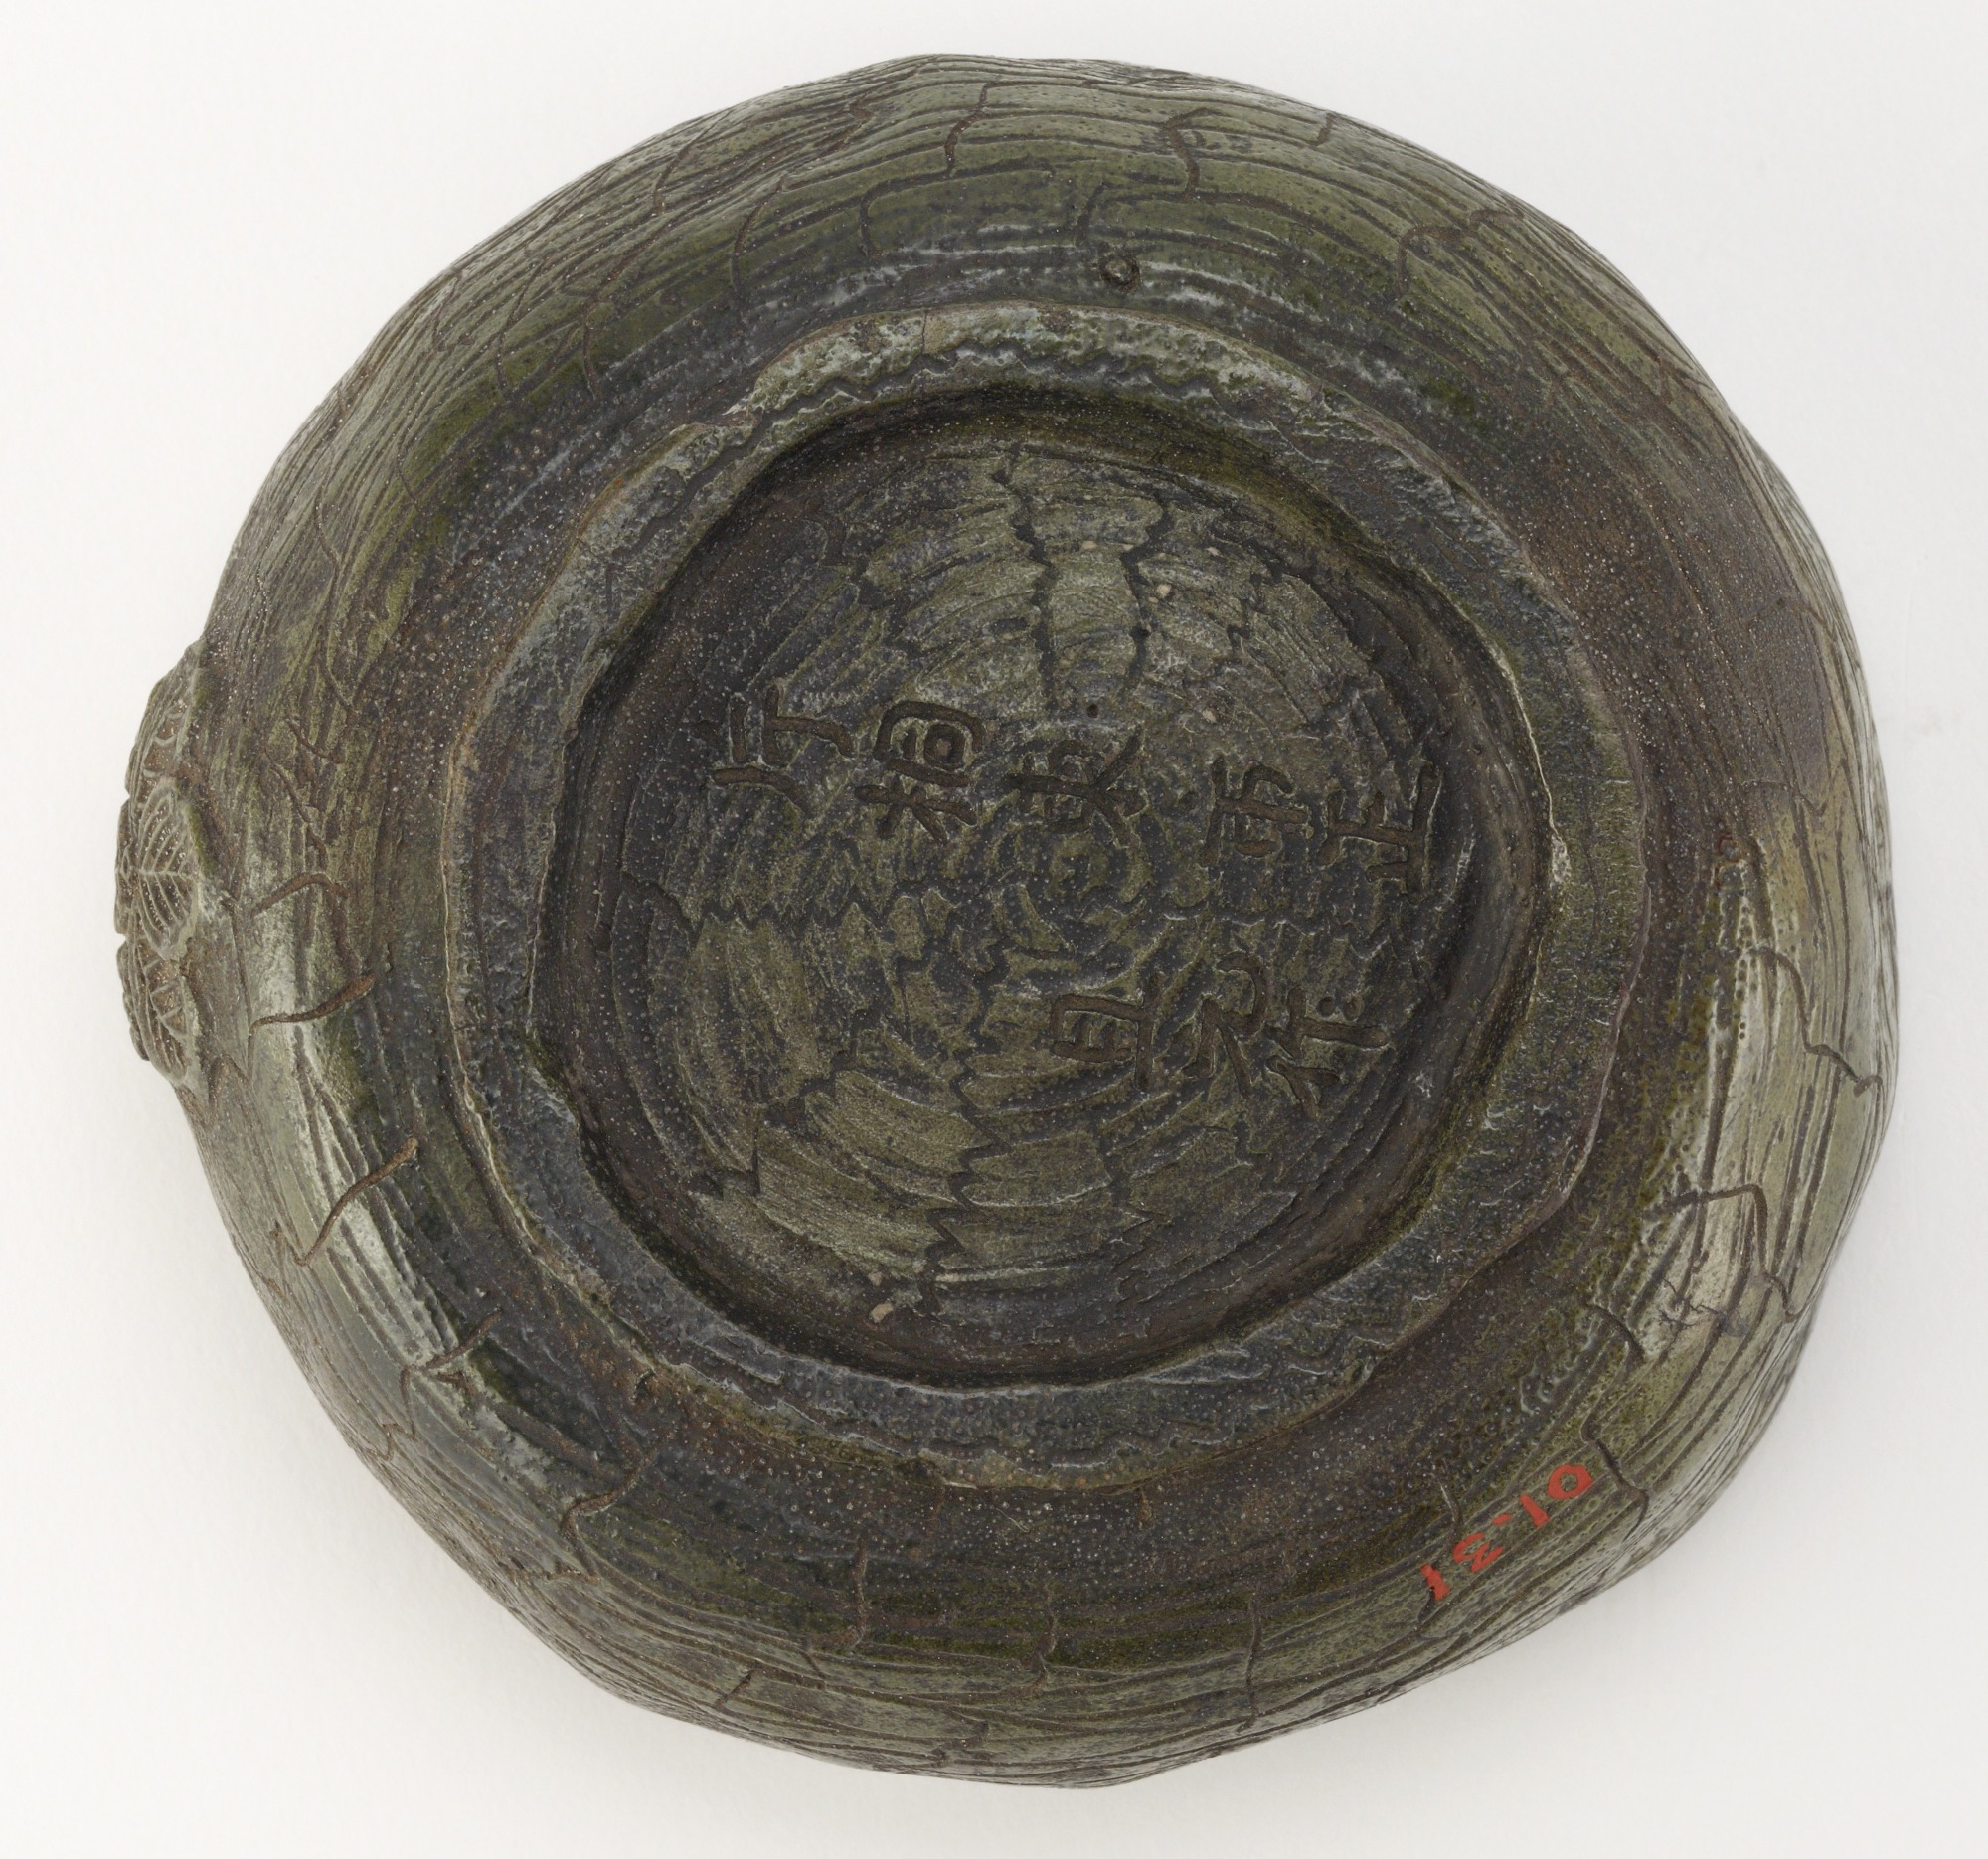 Bowl with paulownia crest, unknown Raku ware workshop